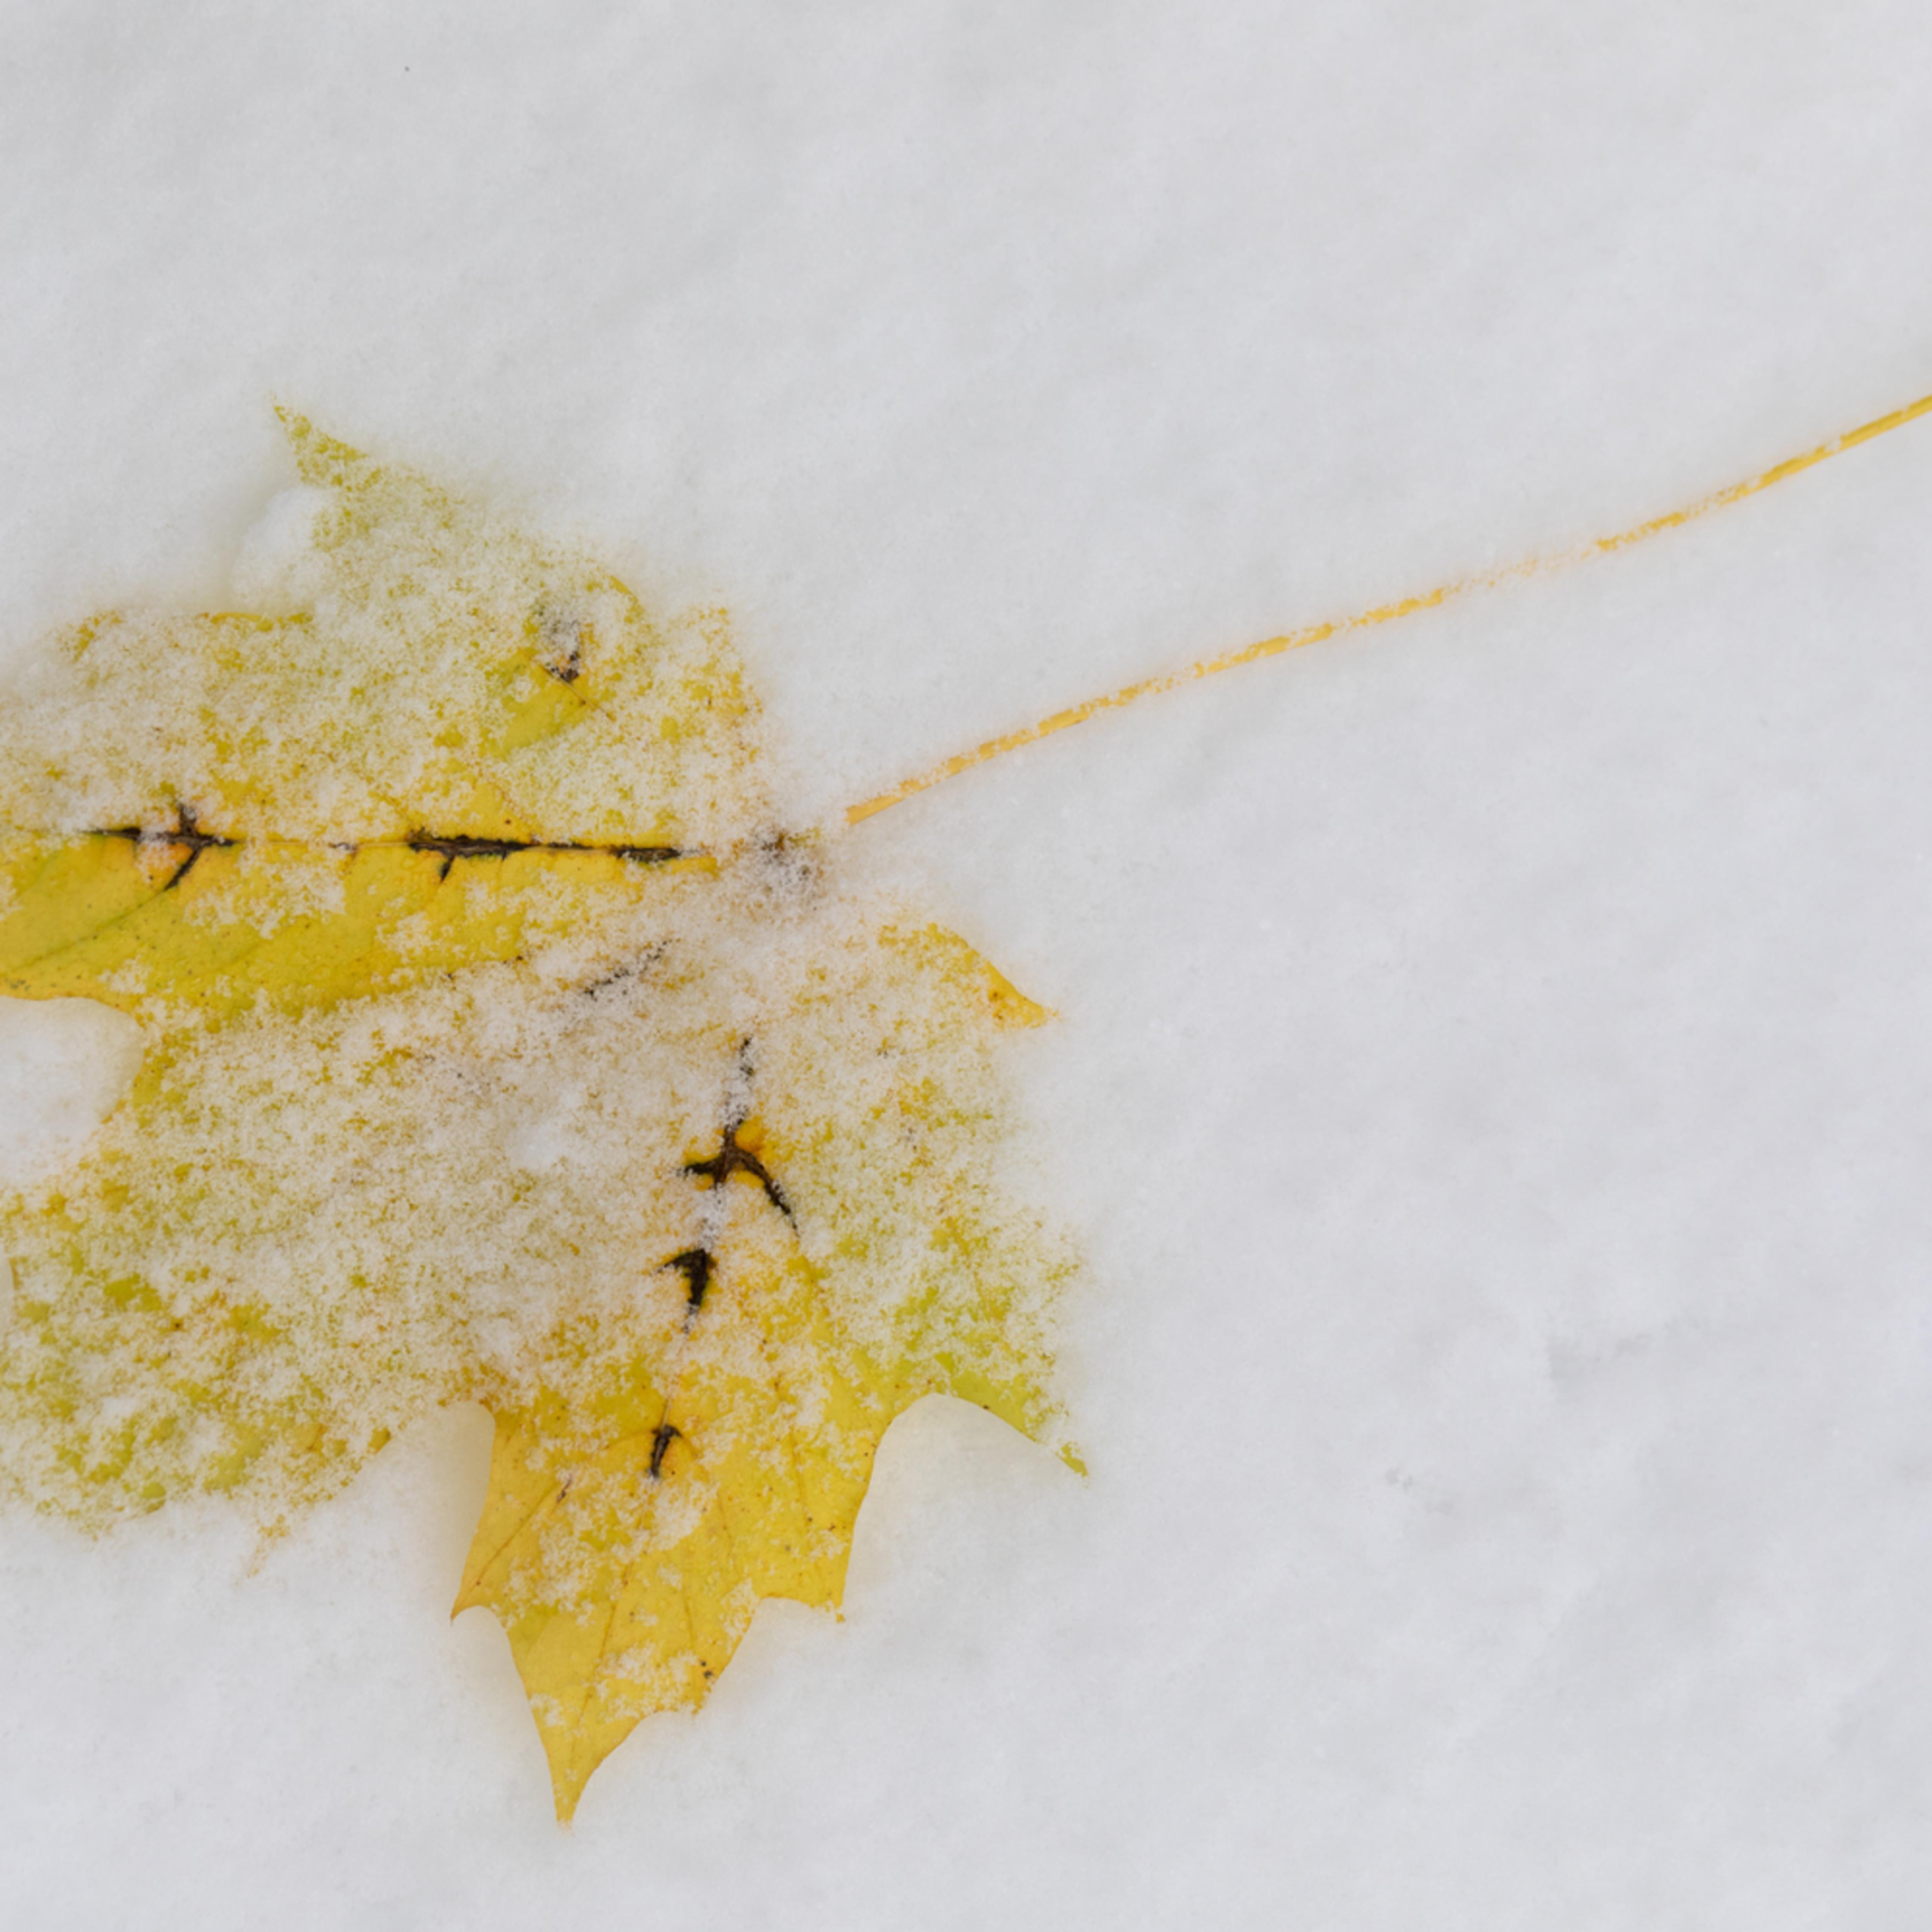 Snow leaf e15458 sxzytl